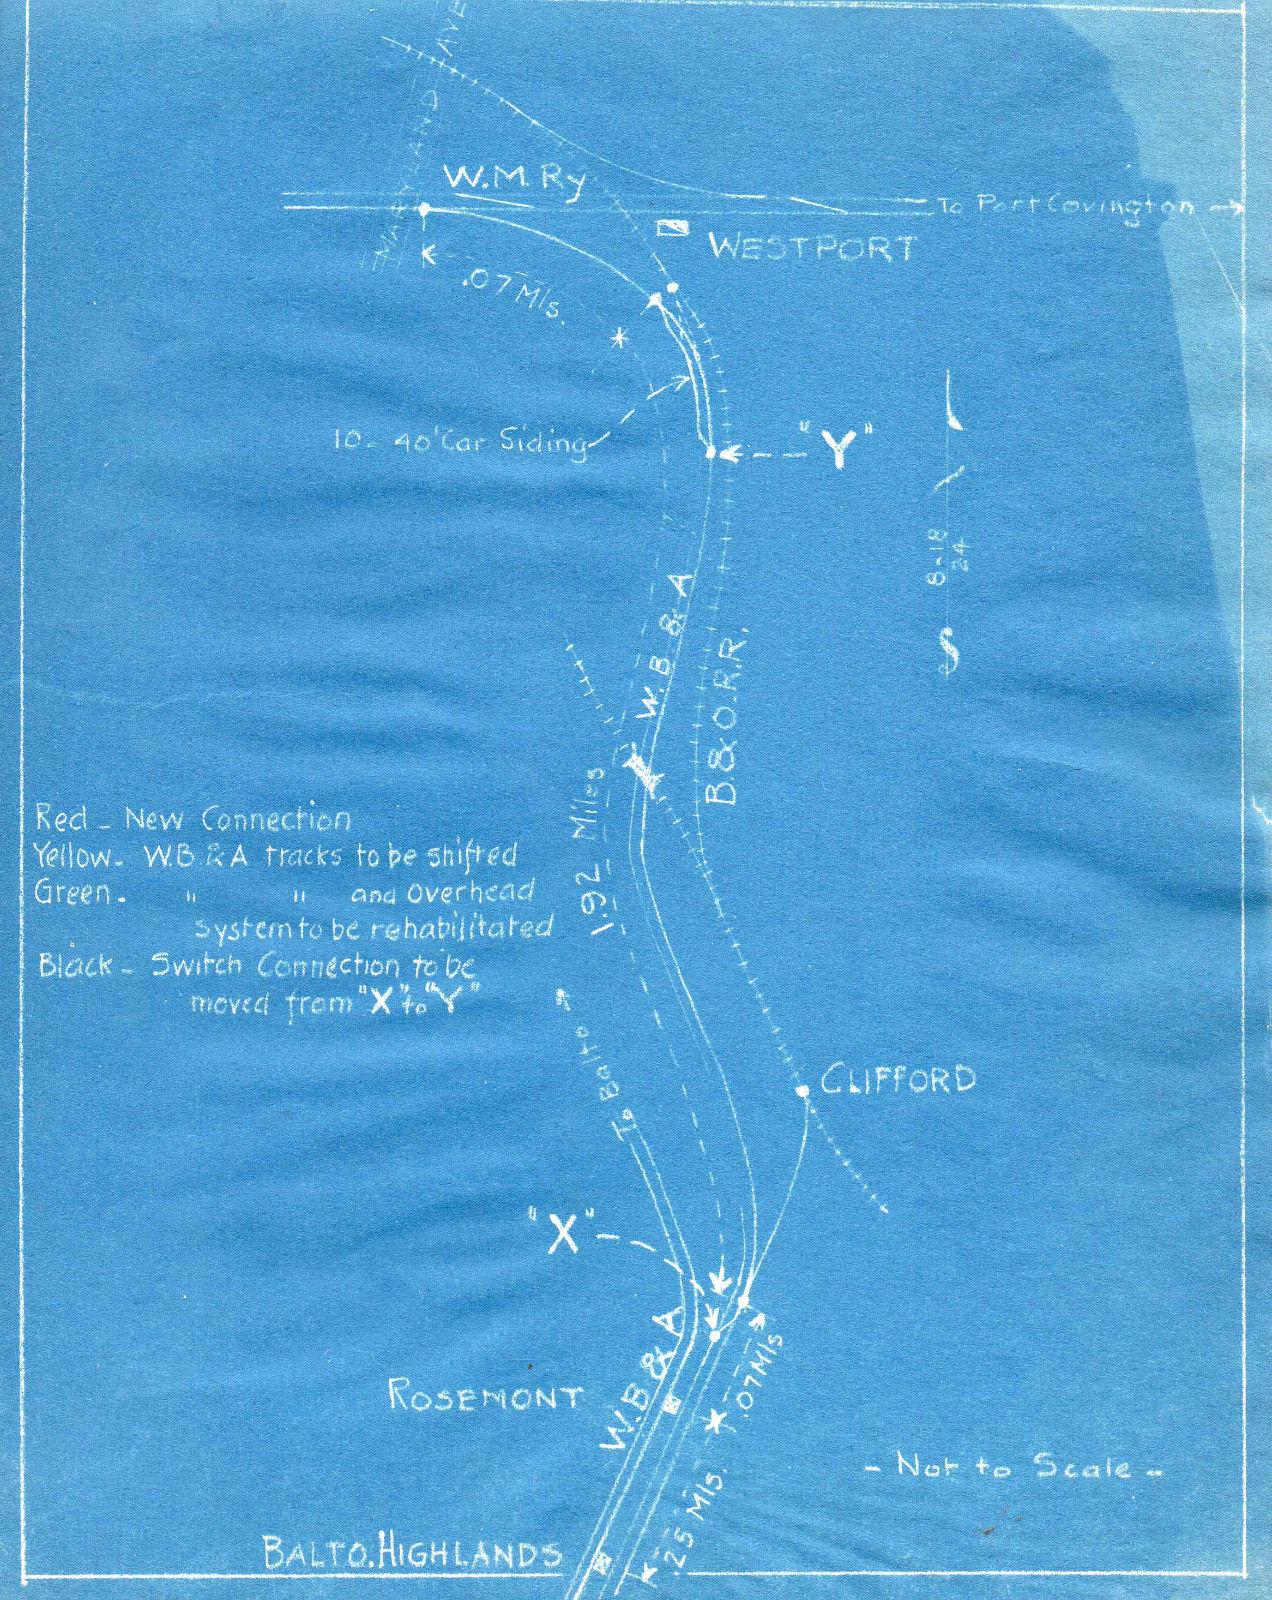 Washington, Baltimore & Annapolis Railroad Blueprints showing Rosemont Station. Date: Unknown. Source: Unknown.